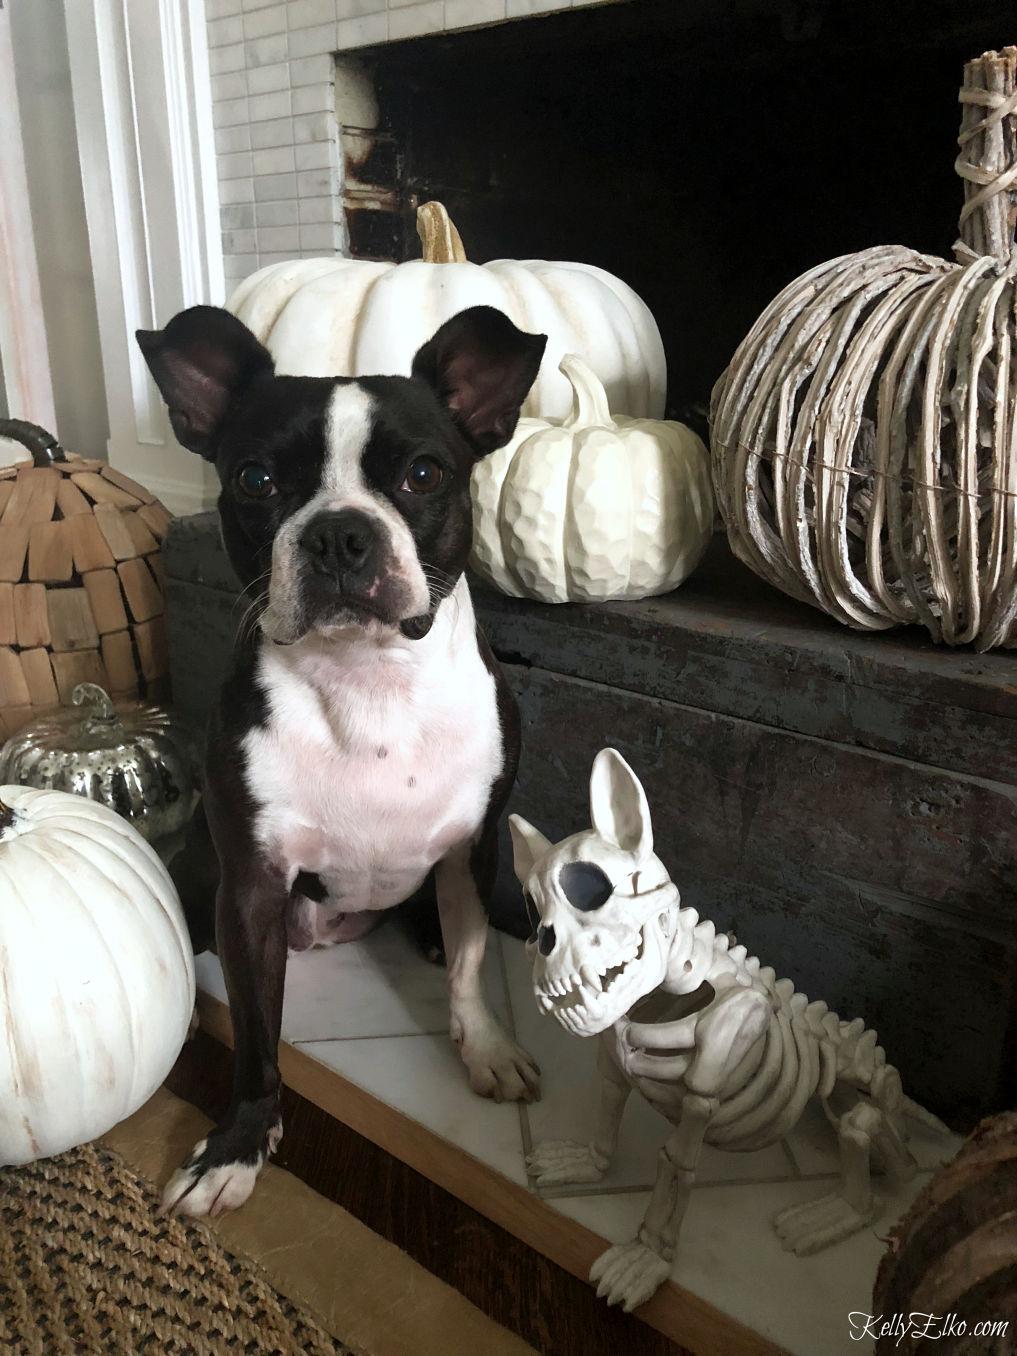 Dog skeleton with Boston Terrier! Such a fun Halloween decoration kellyelko.com #halloween #halloweendecor #halloweendecorating #skeleton #dogcostumes #falldecor